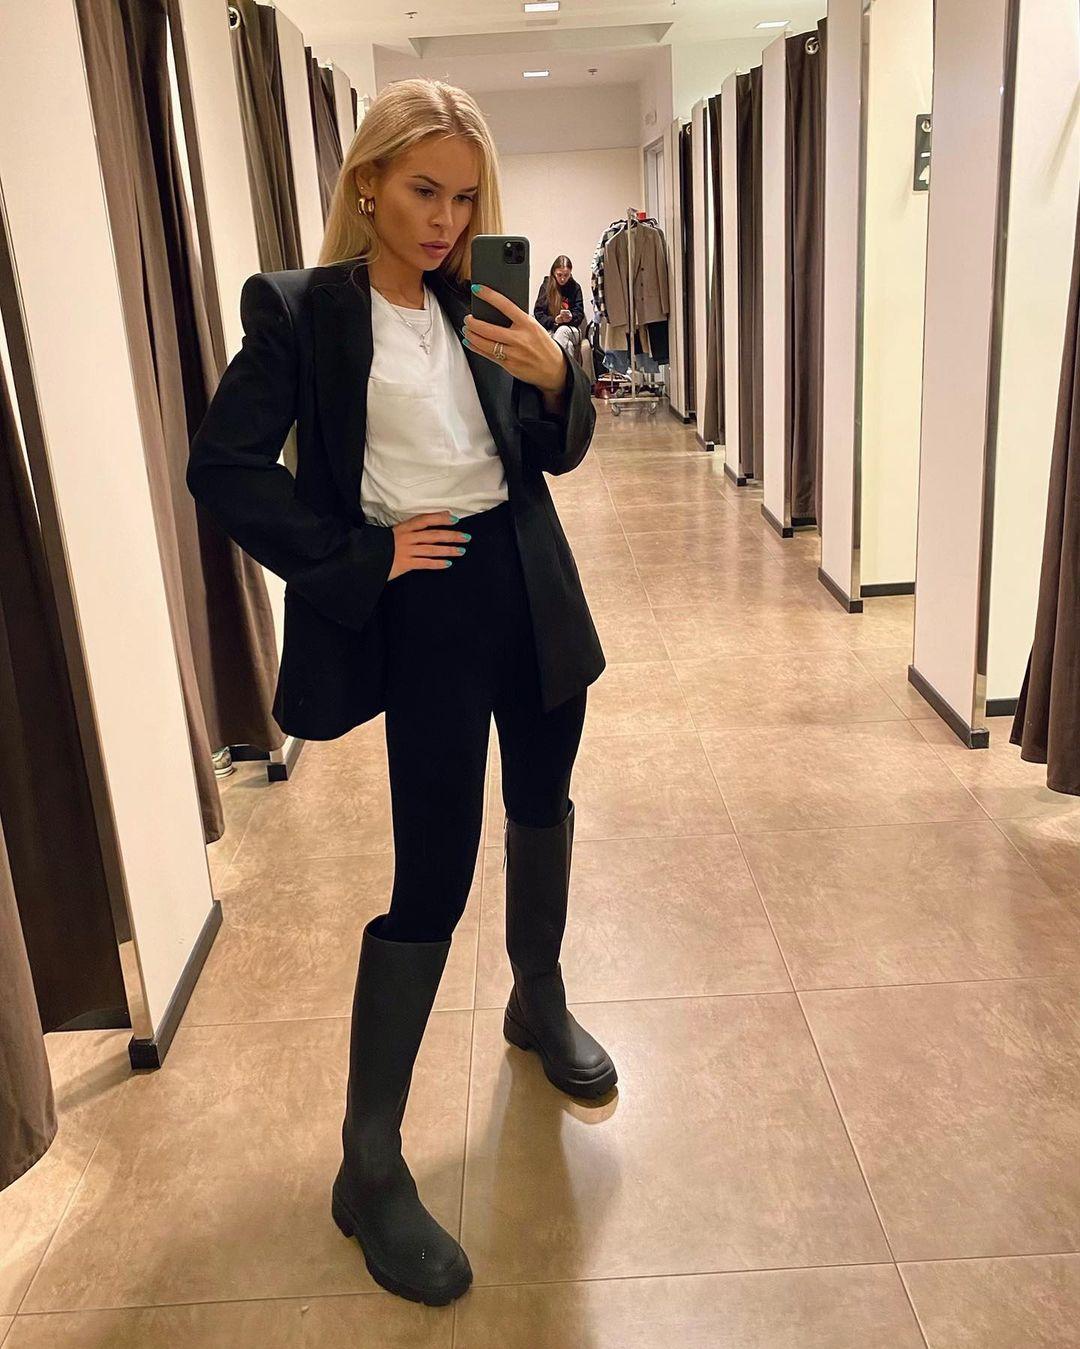 Vlada-Sharpilova-Wallpapers-Insta-Fit-Bio-4